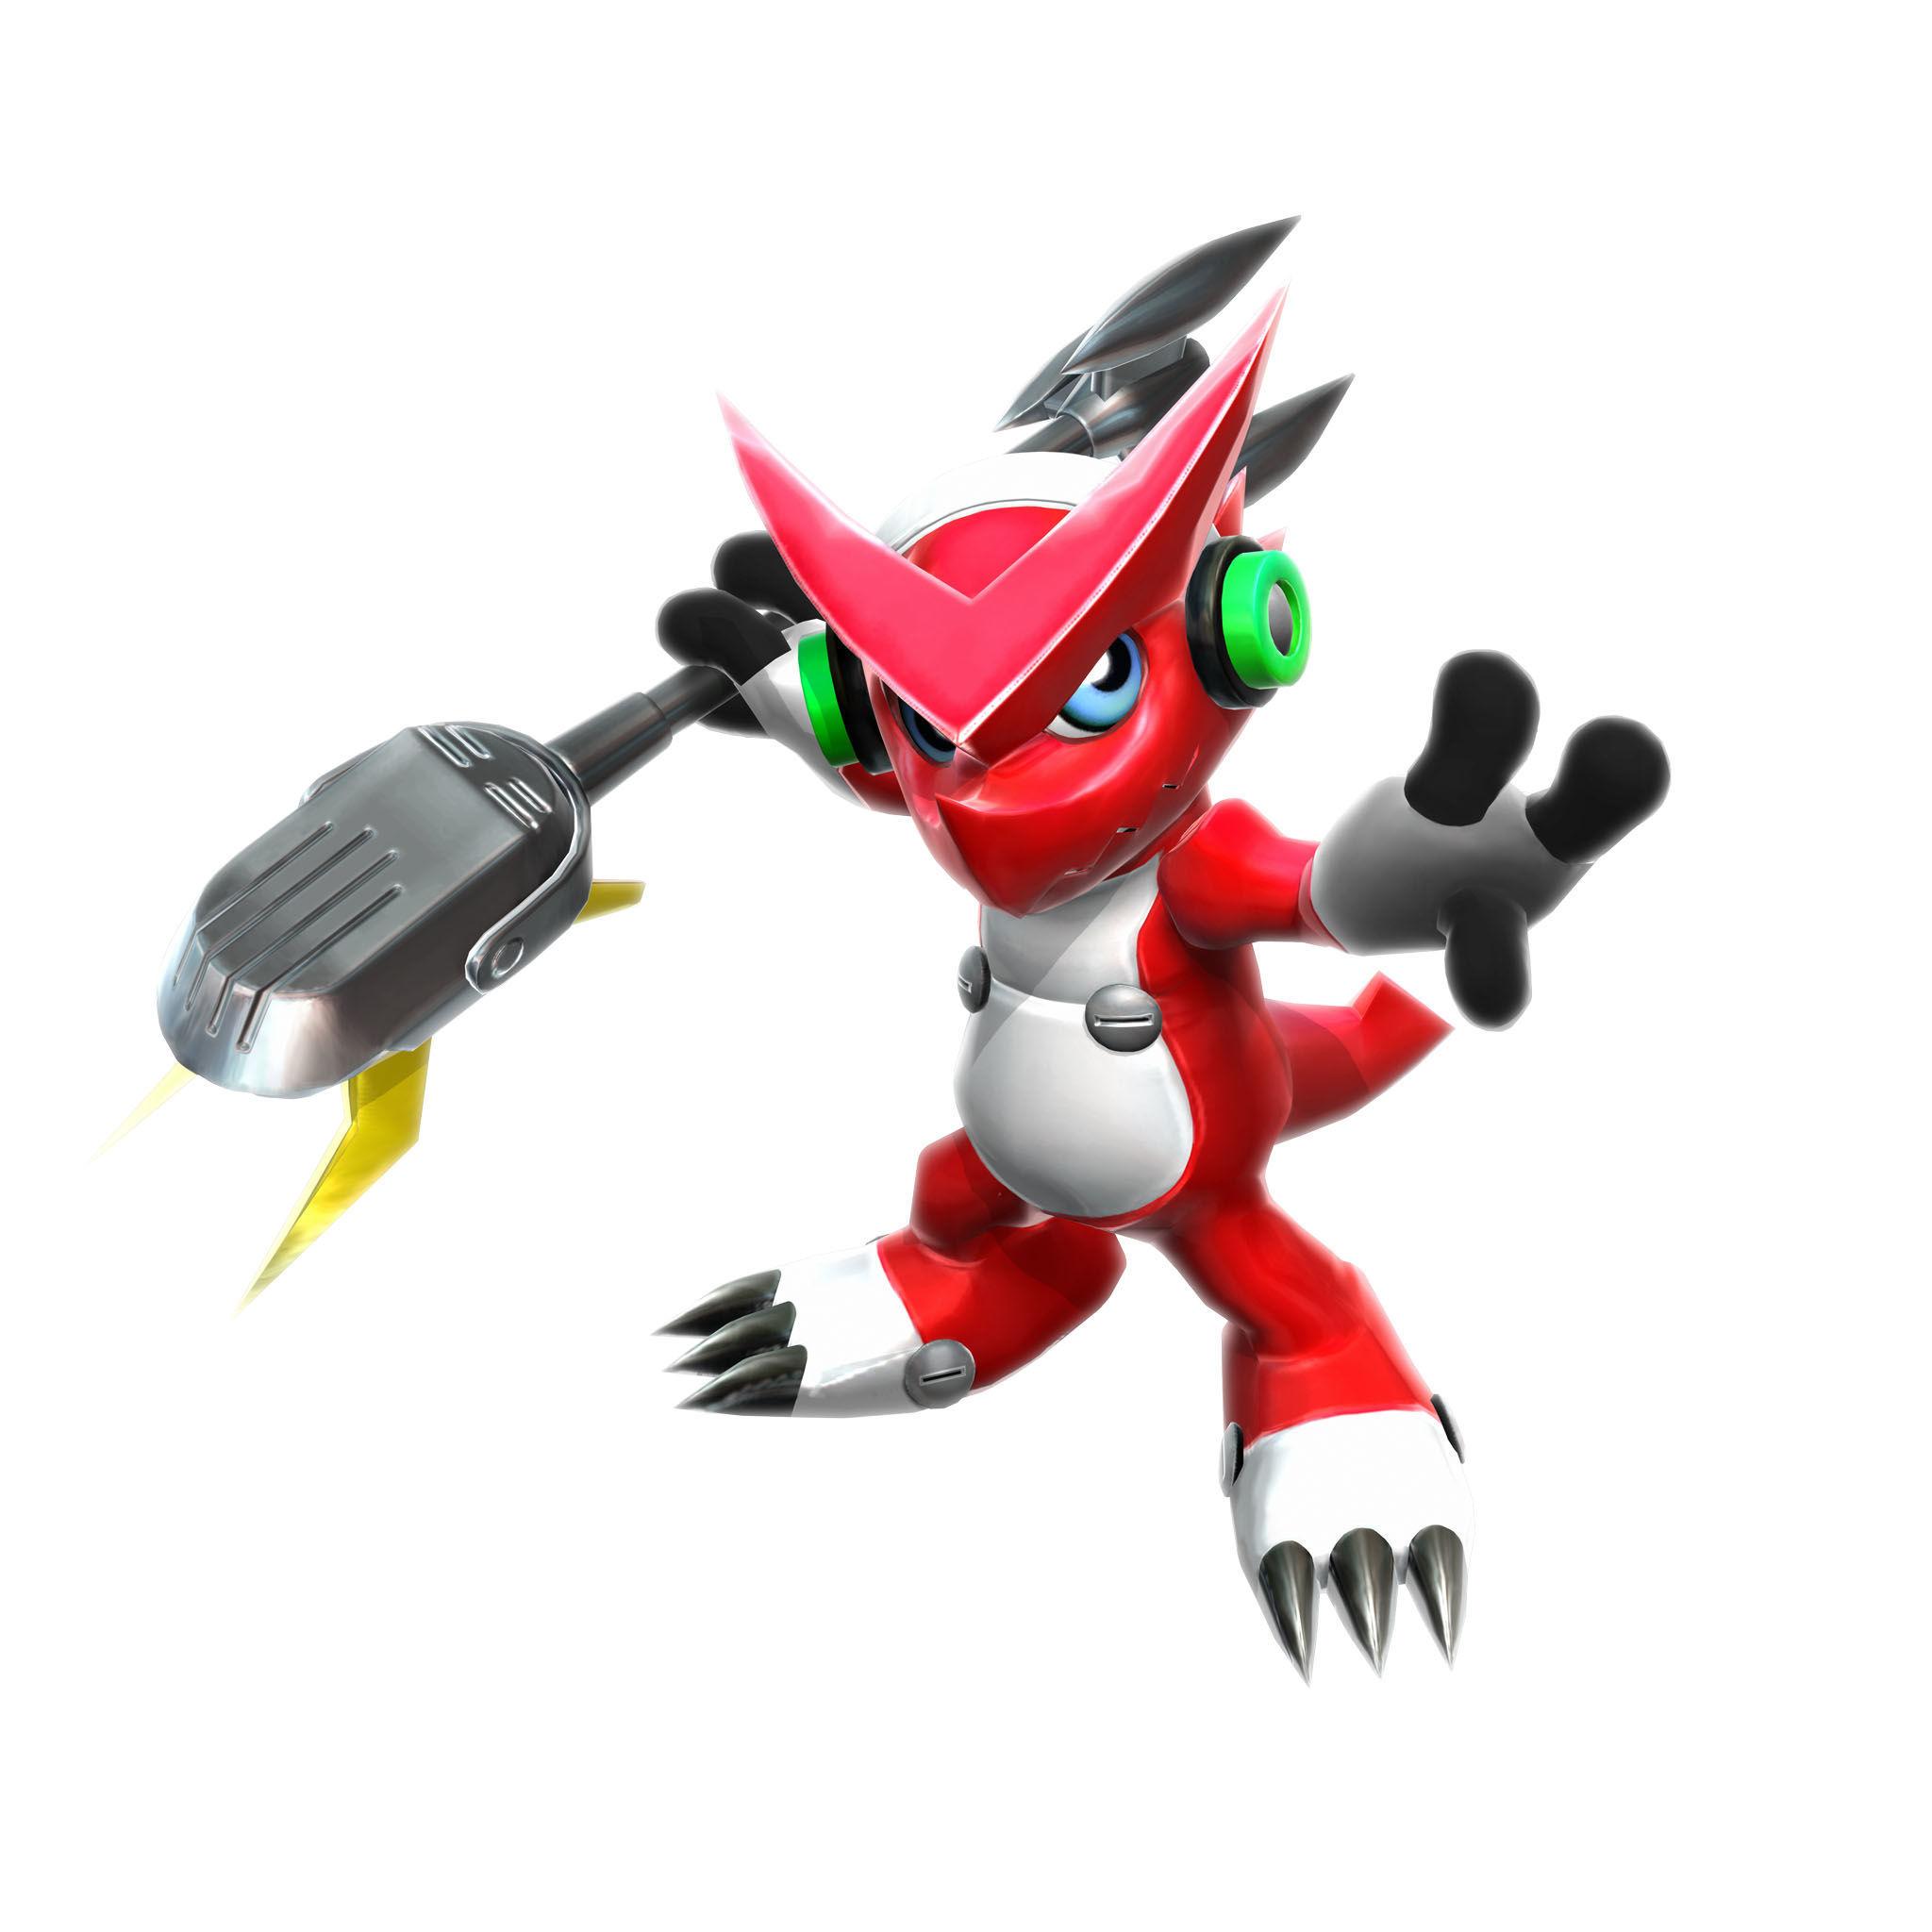 [Jogo] Digimon All-Star Rumble Digimon-allstar-rumble-2014731155850_16